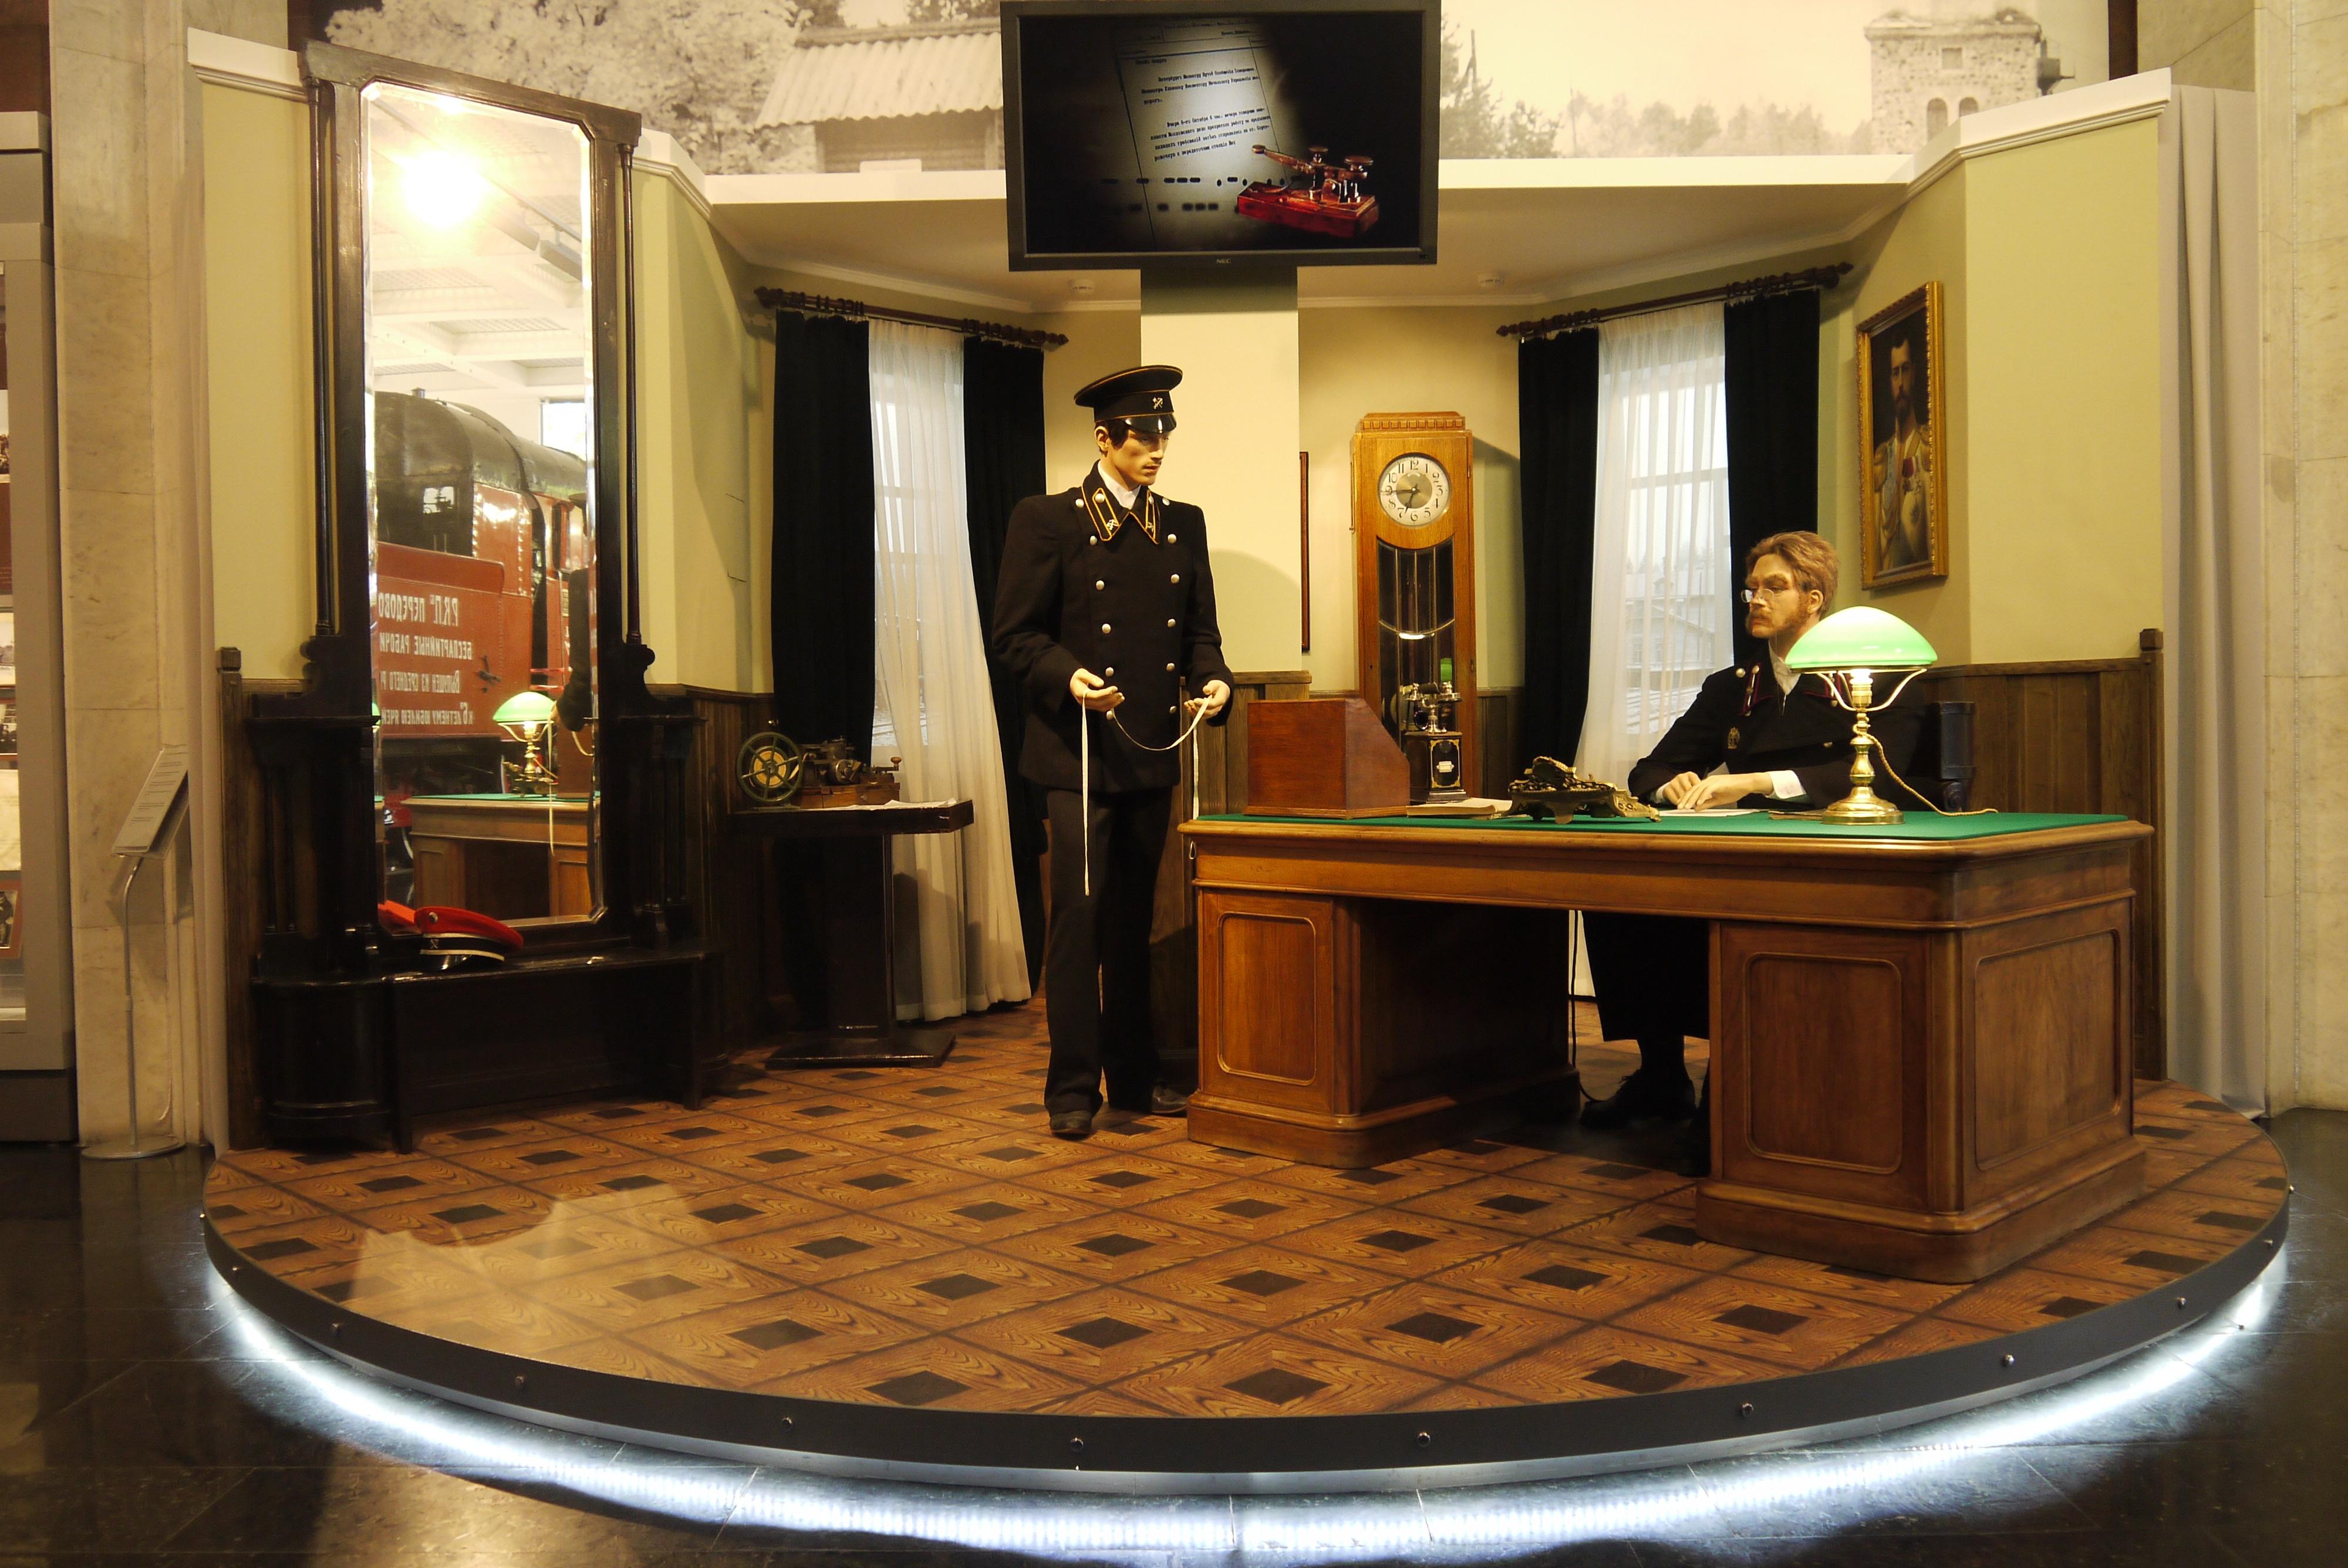 century office. File:Model Of A 19th Century Russian Railway Office.JPG Office